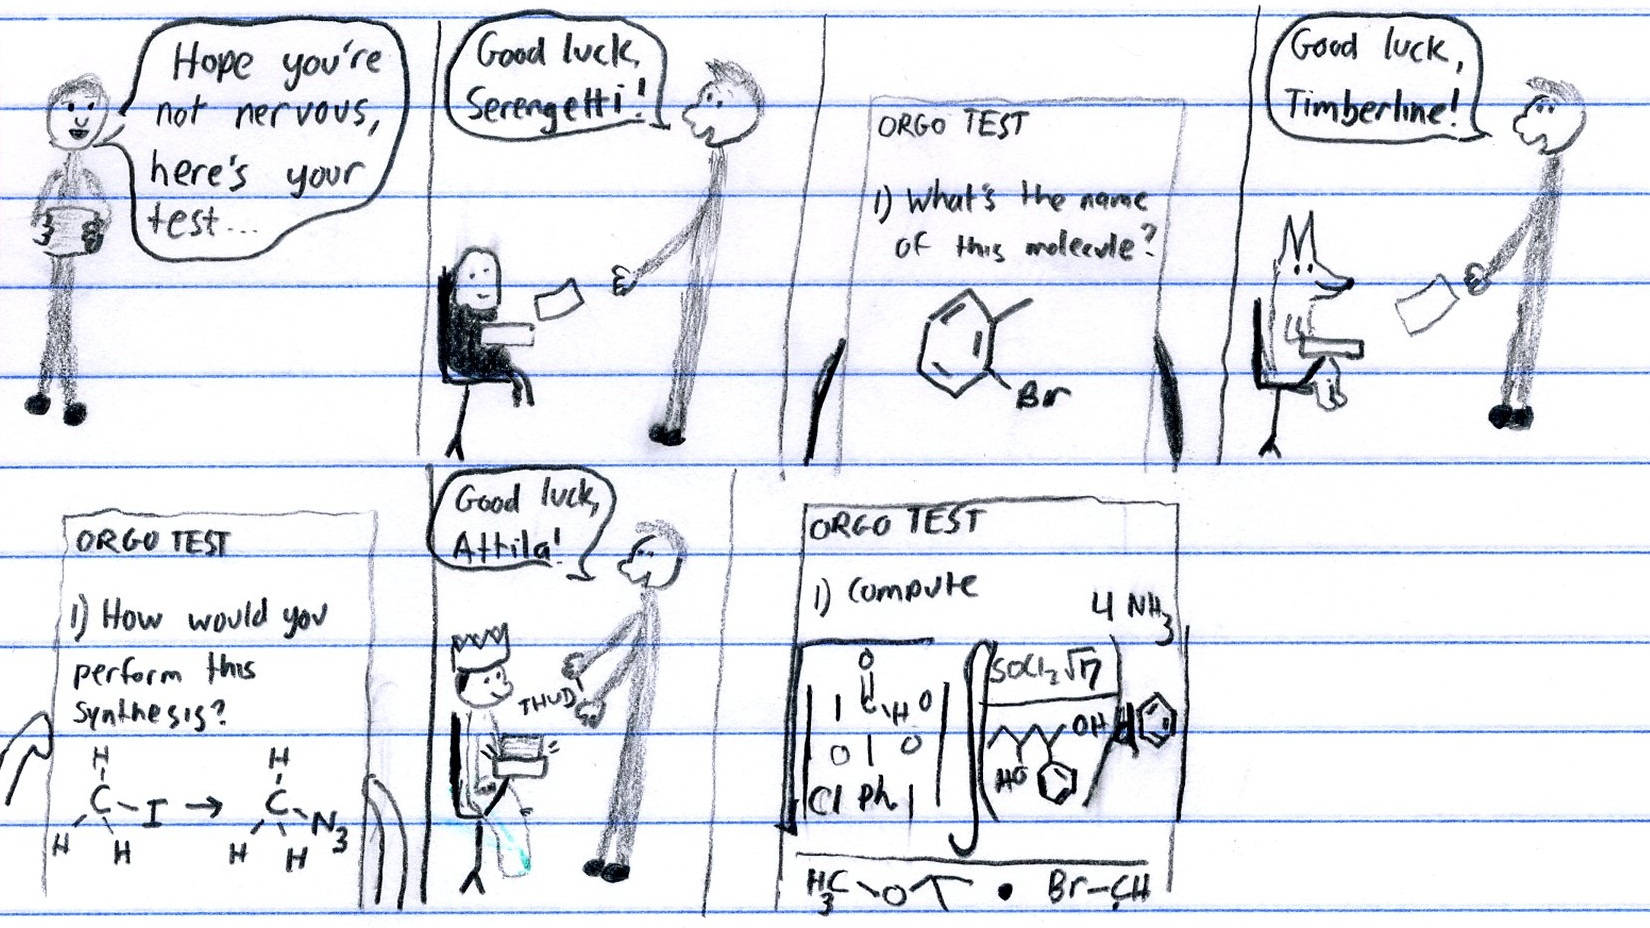 Sherbinski's Test